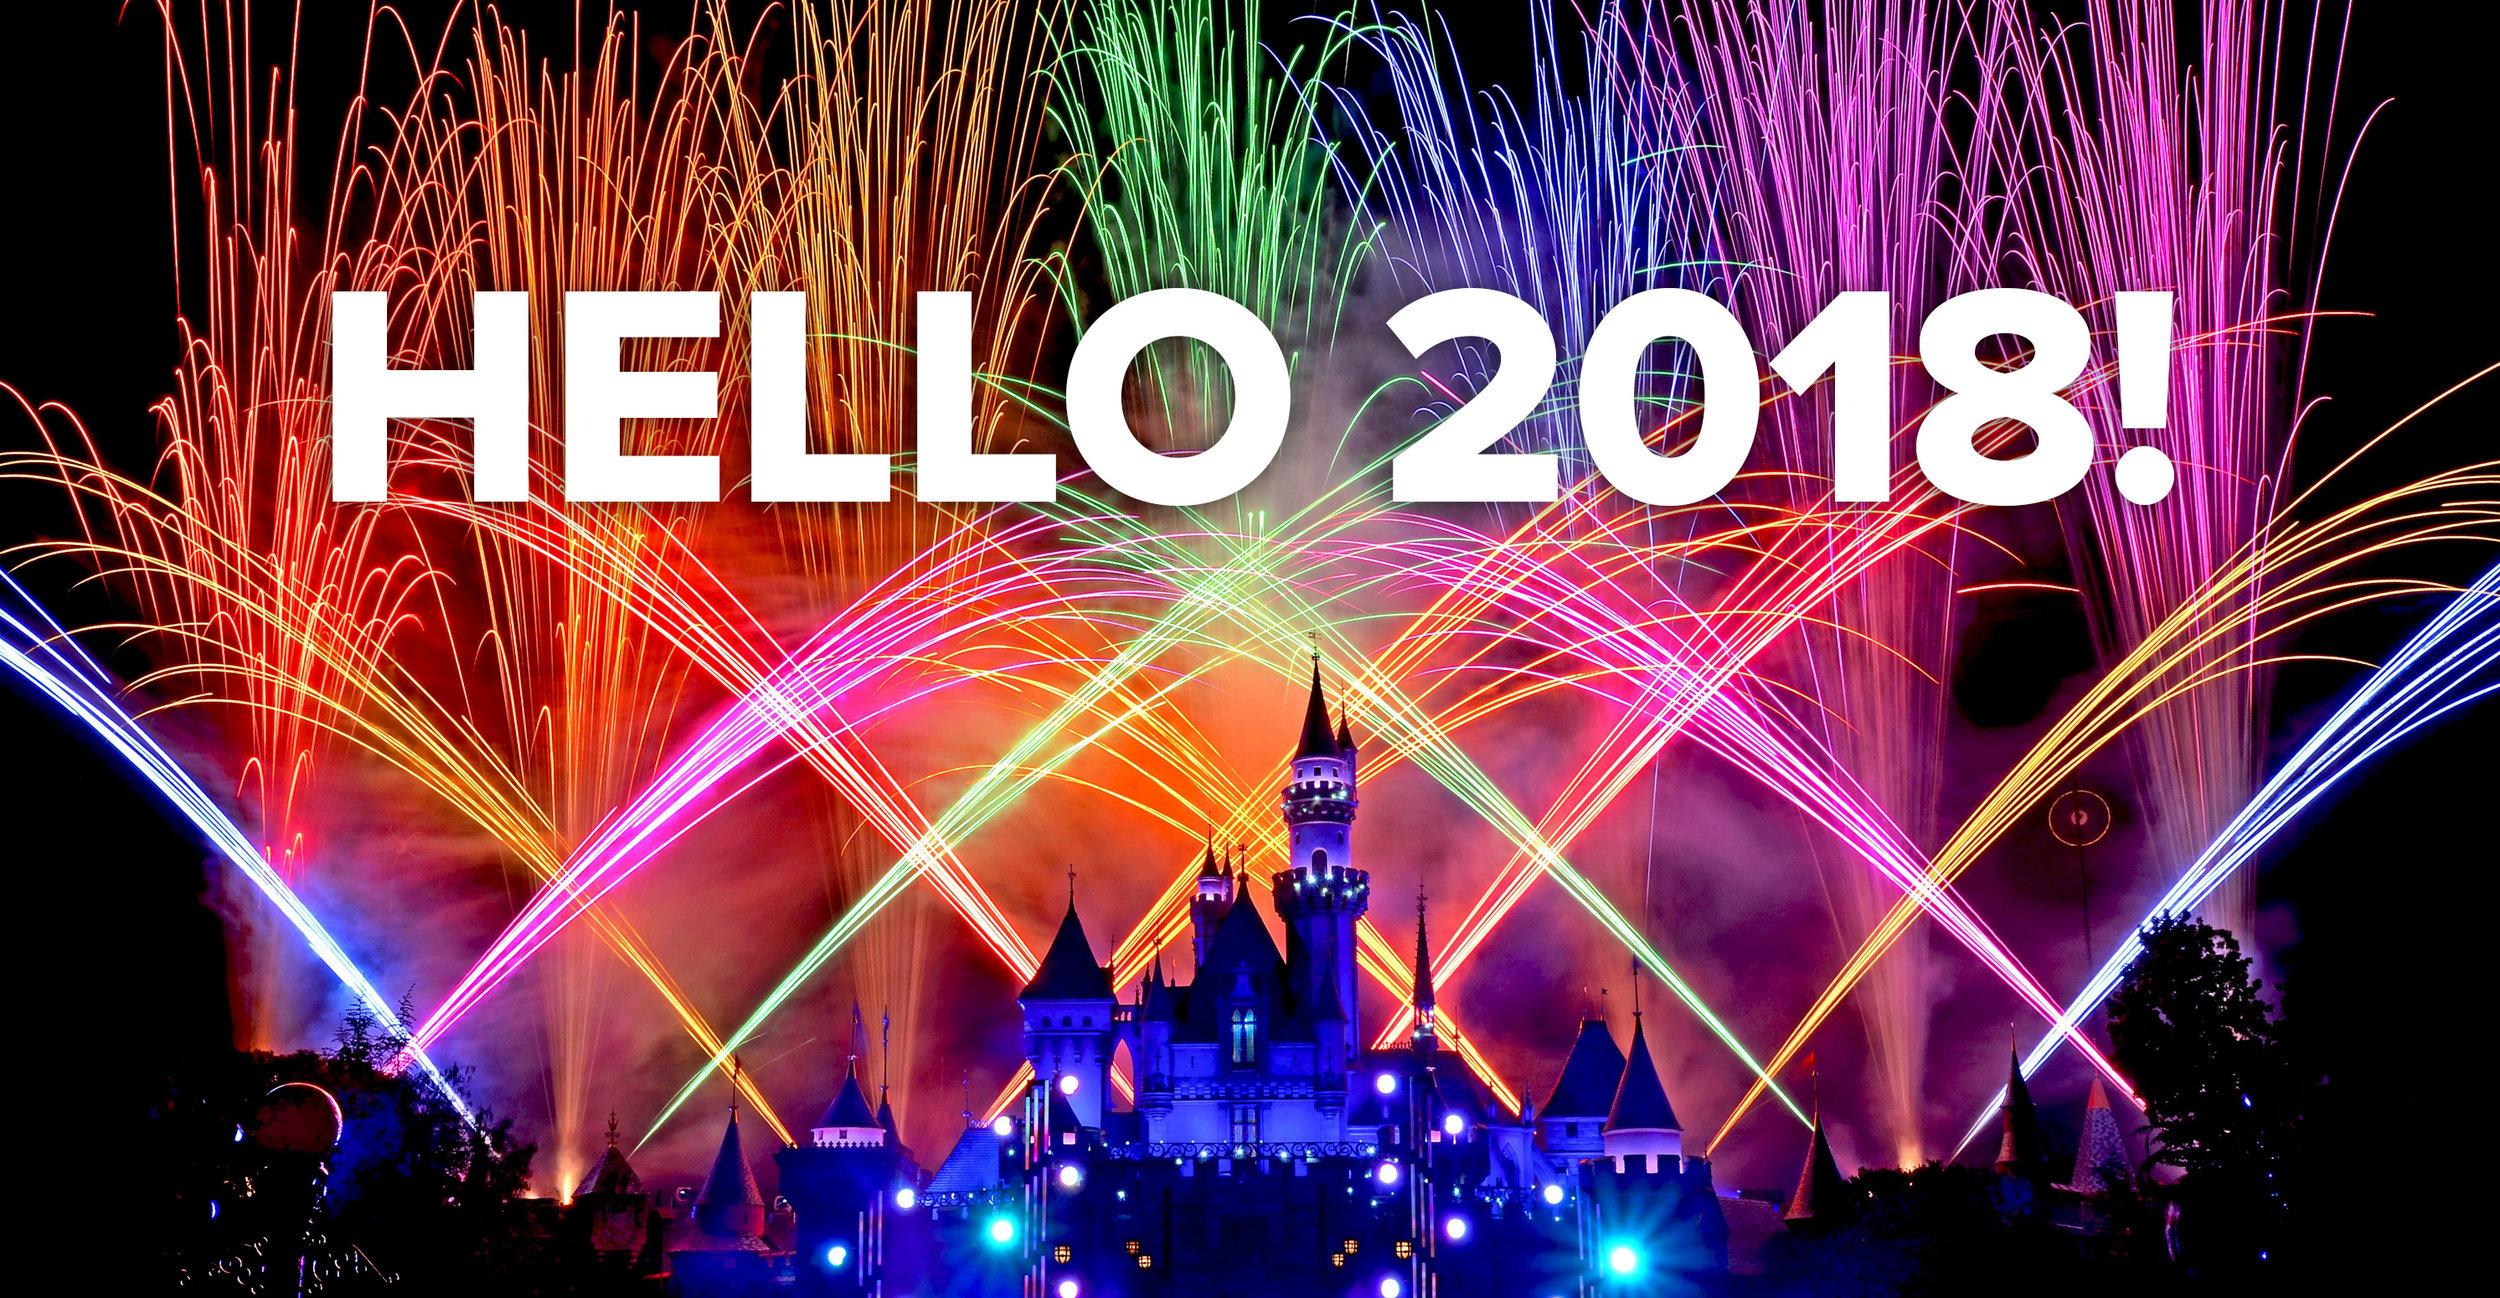 disney_fireworks_2018.jpg